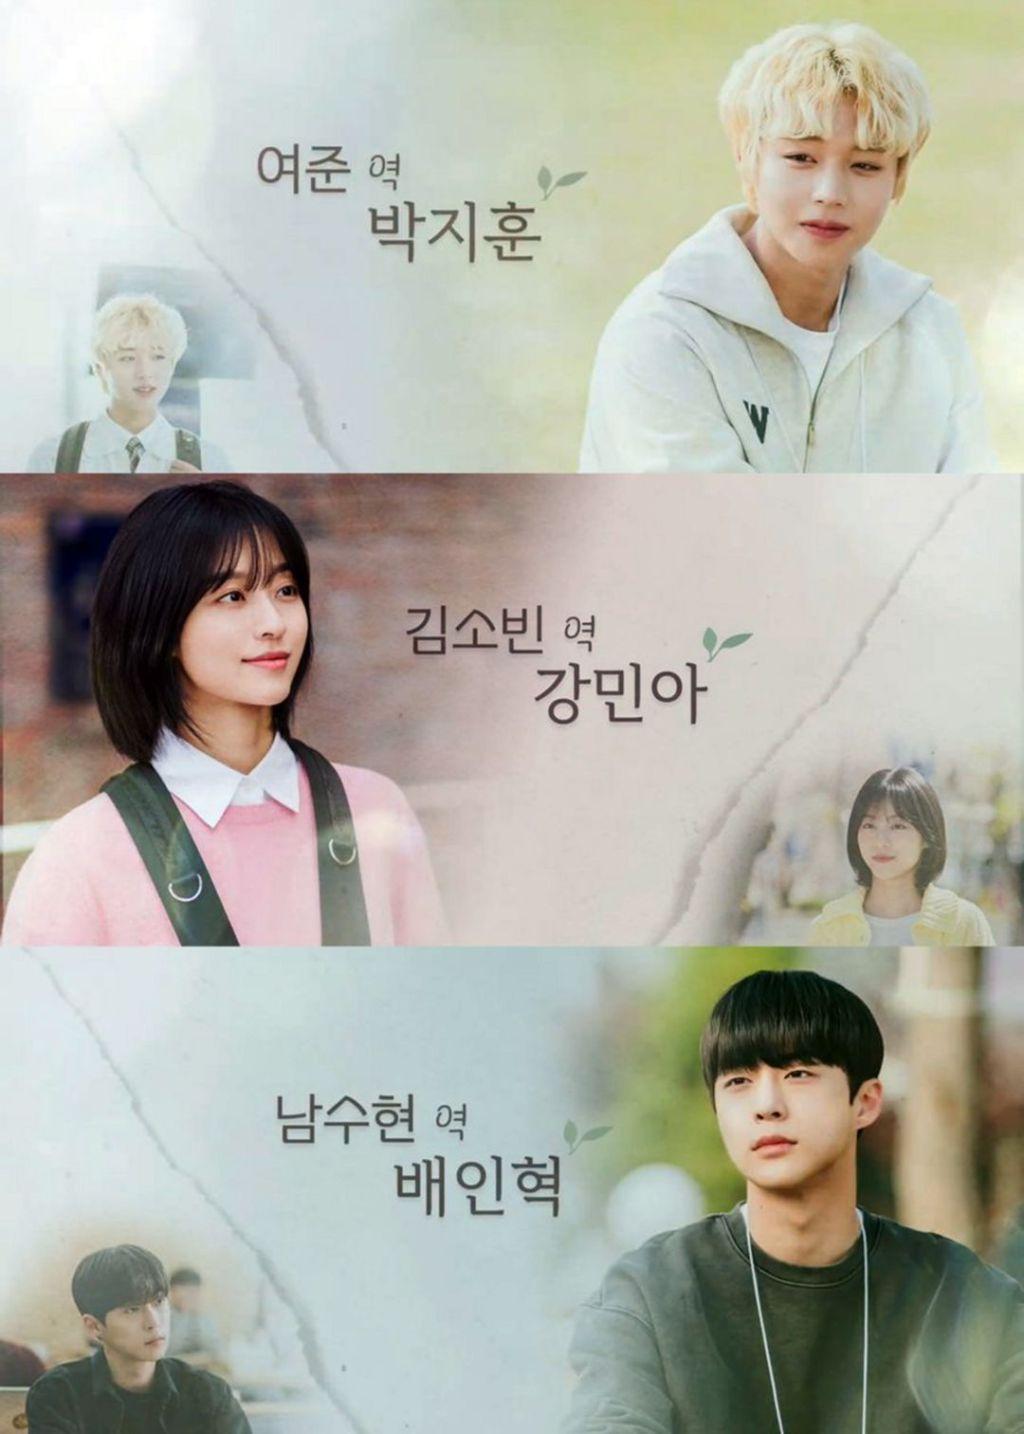 Sinopsis Dan Profil Lengkap Pemeran K-Drama Upcoming Blue Spring From A Distance (2021)